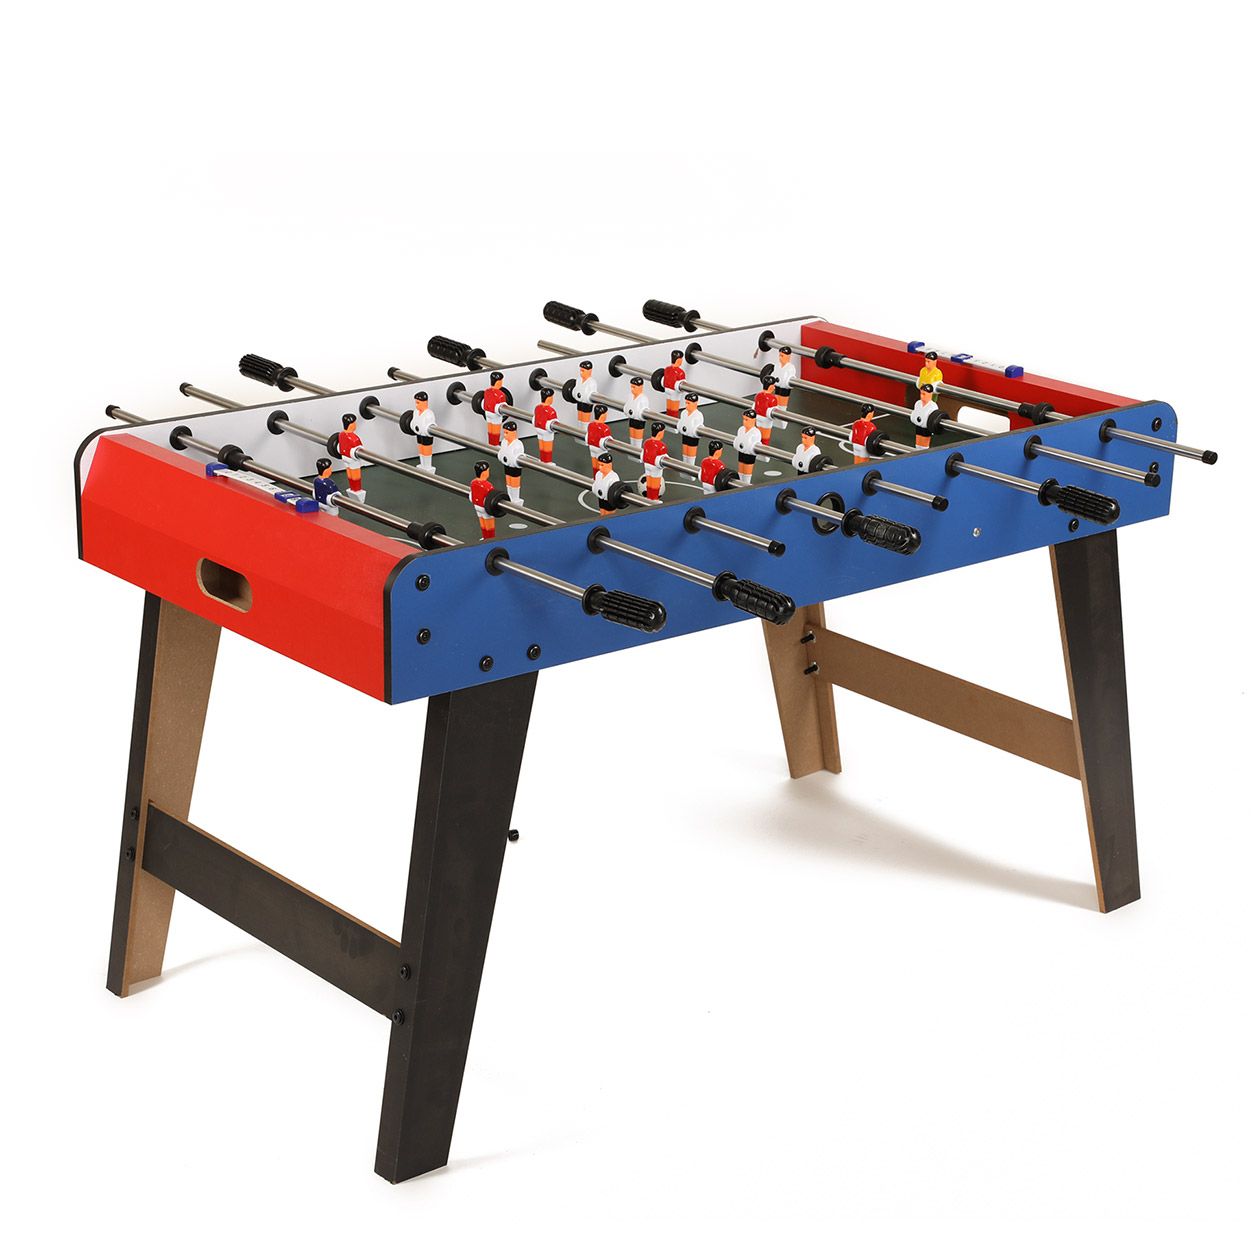 houten voetbaltafel,speeltafel